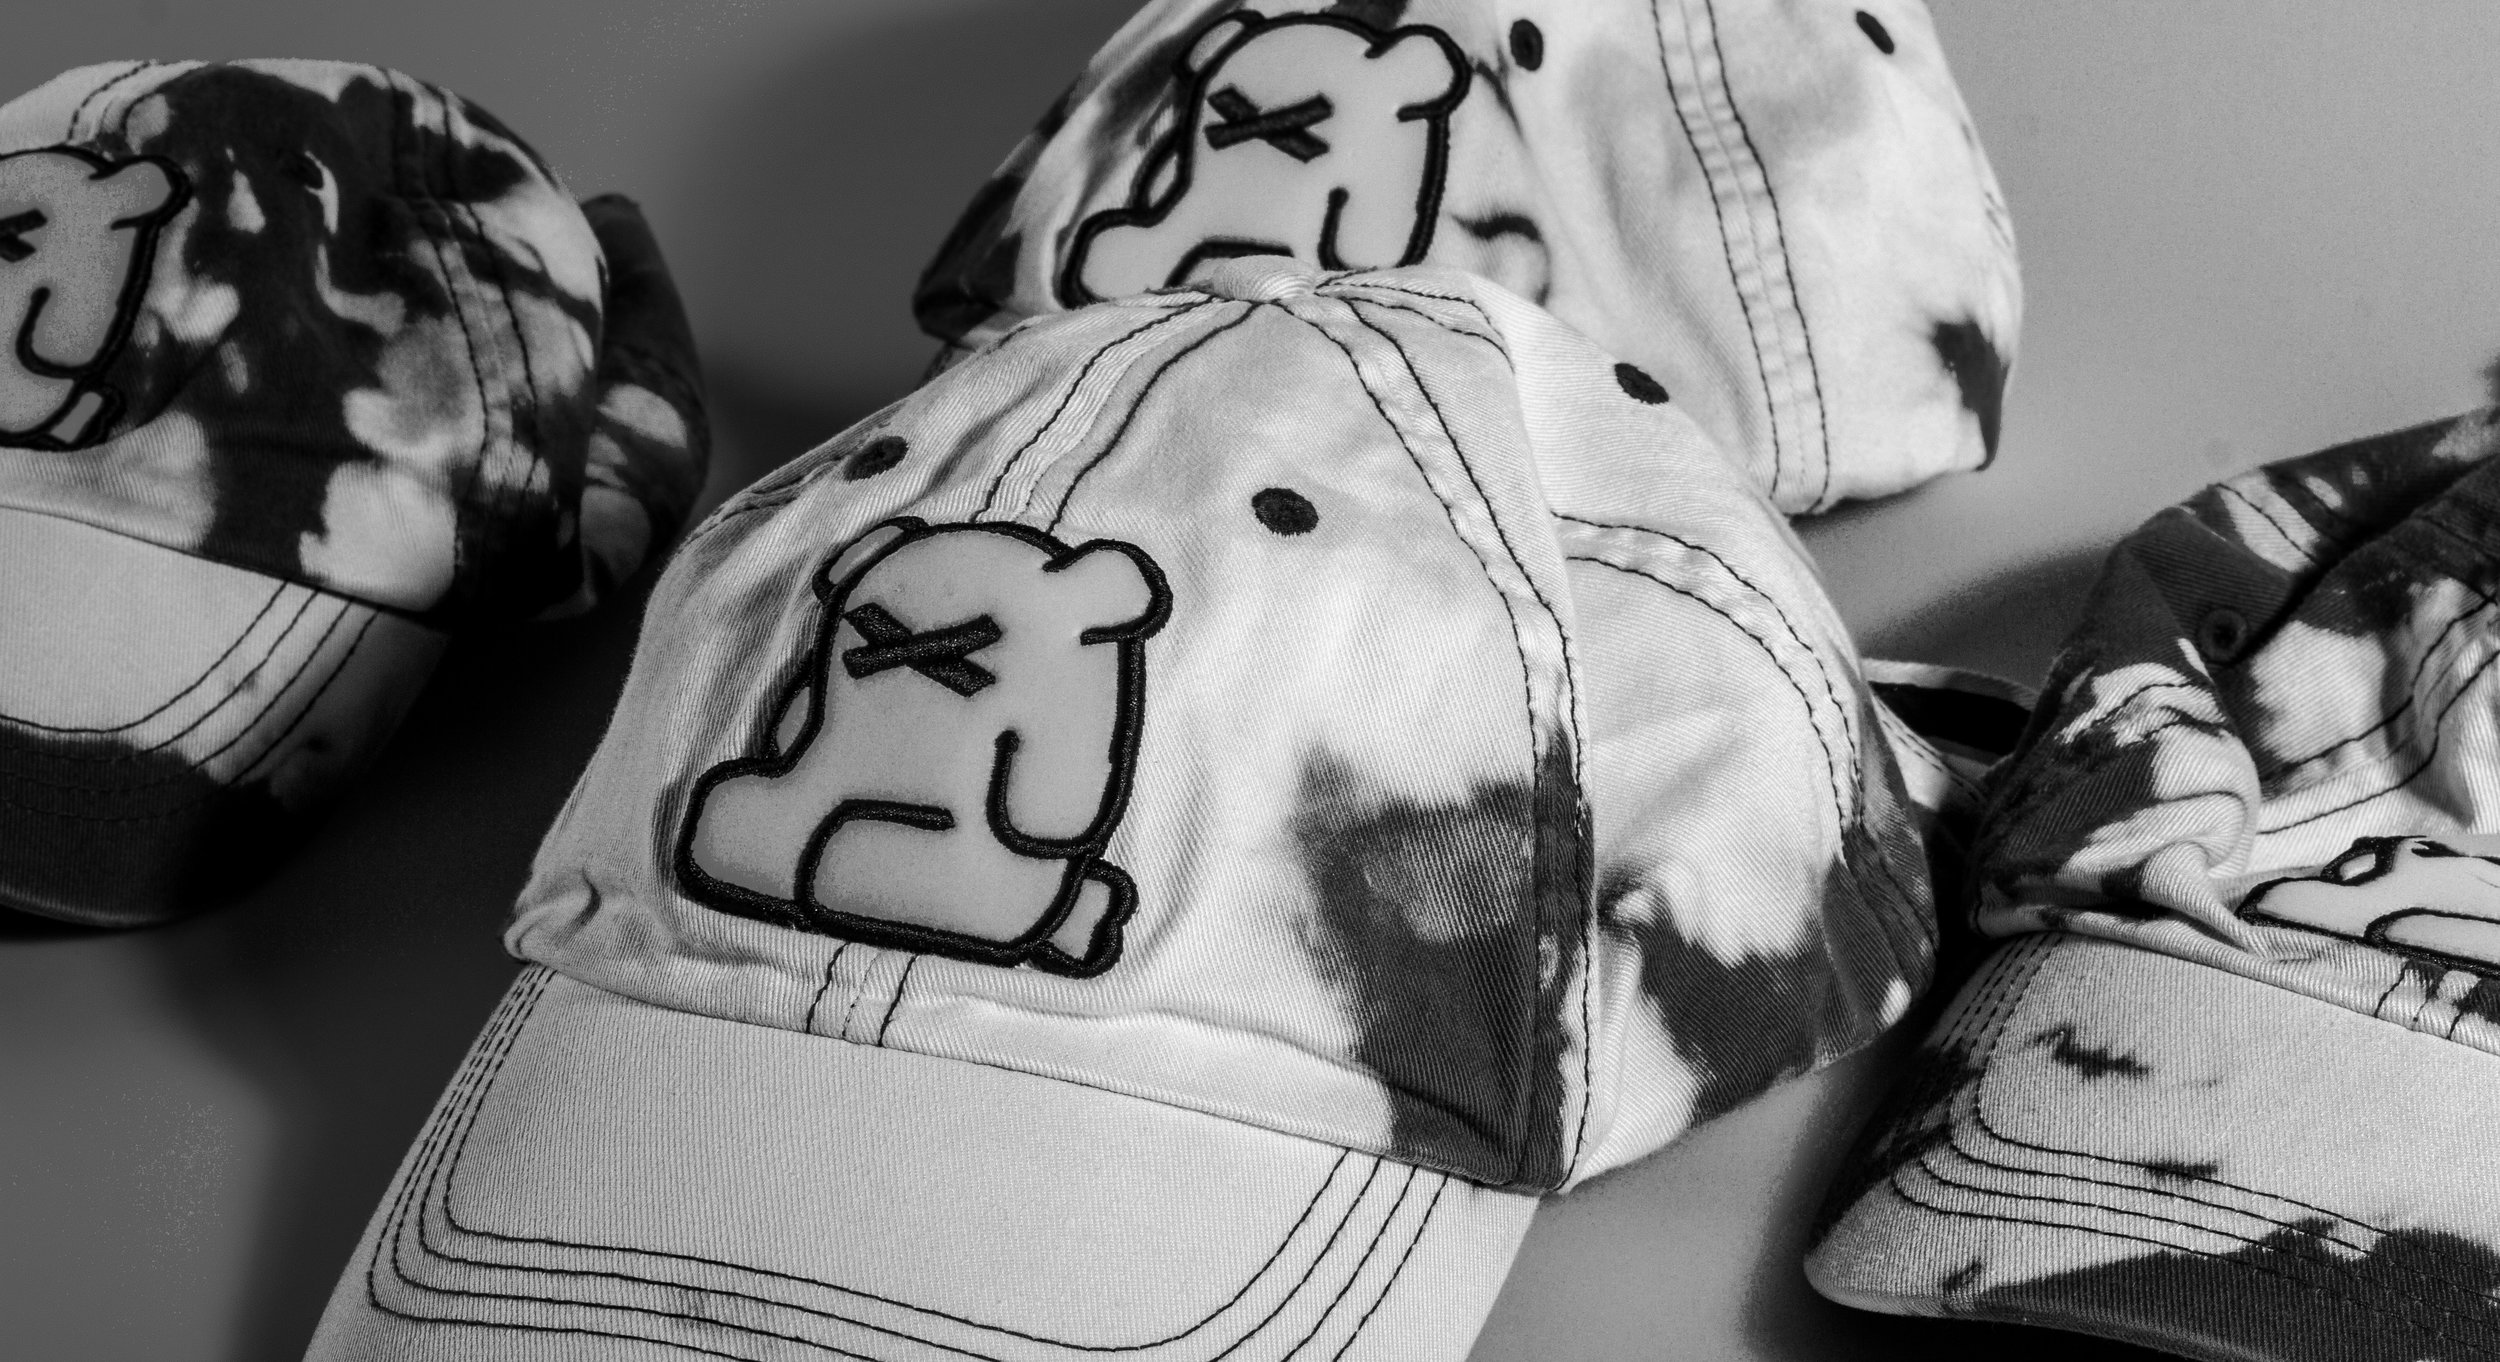 ZUU_hats.jpg